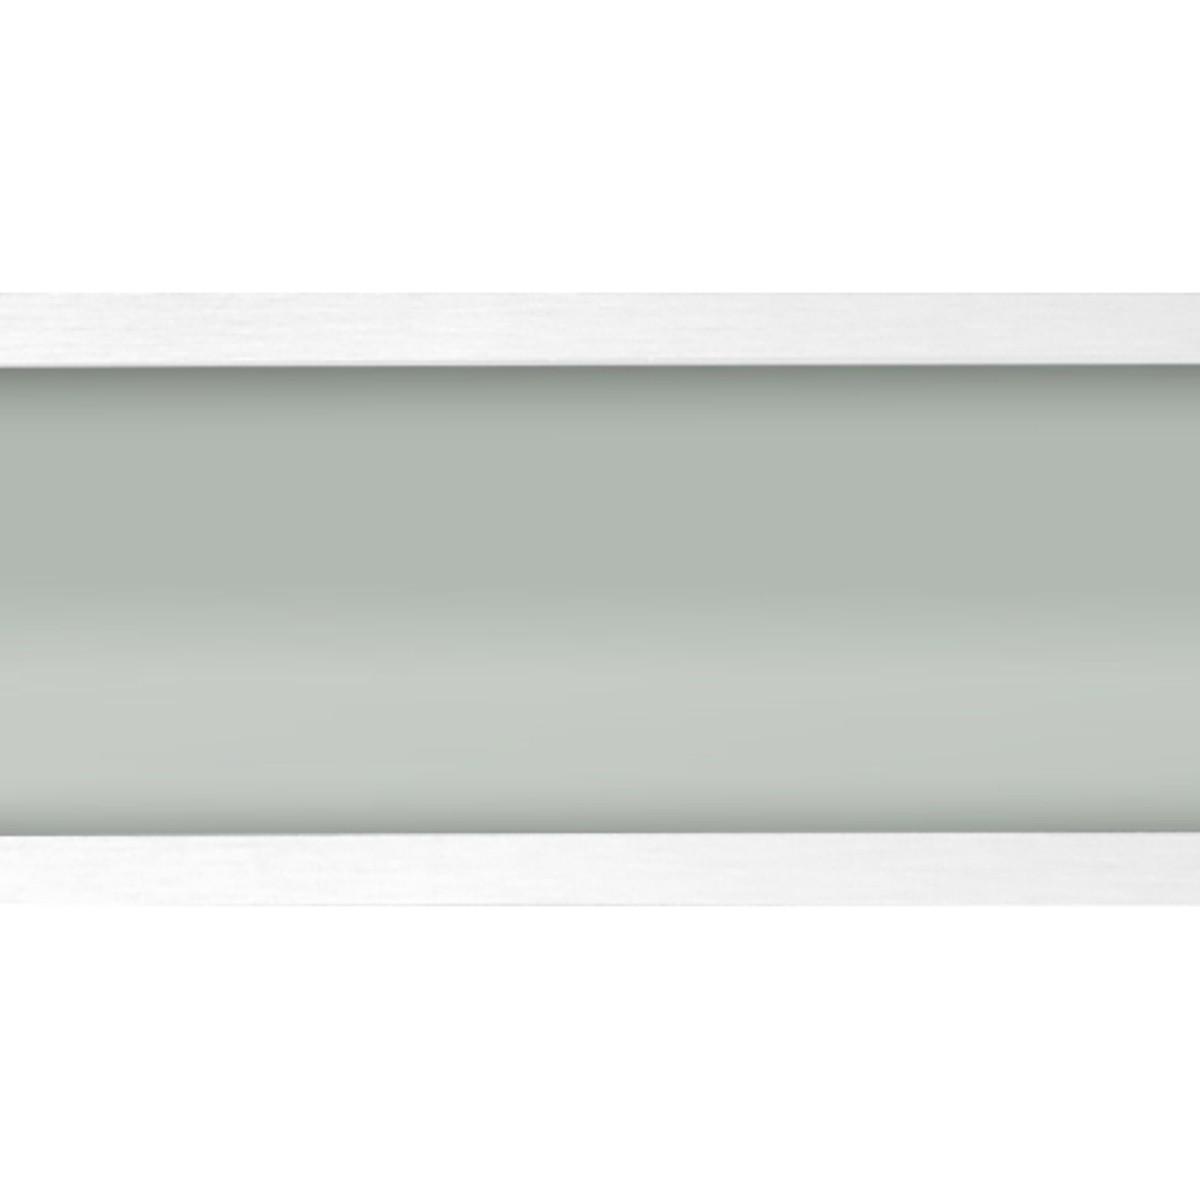 Plafon Space Sobr. Ret. 75cm Alum. Vidro Fosco 2x20w Fluor. Branco 05 Unidades